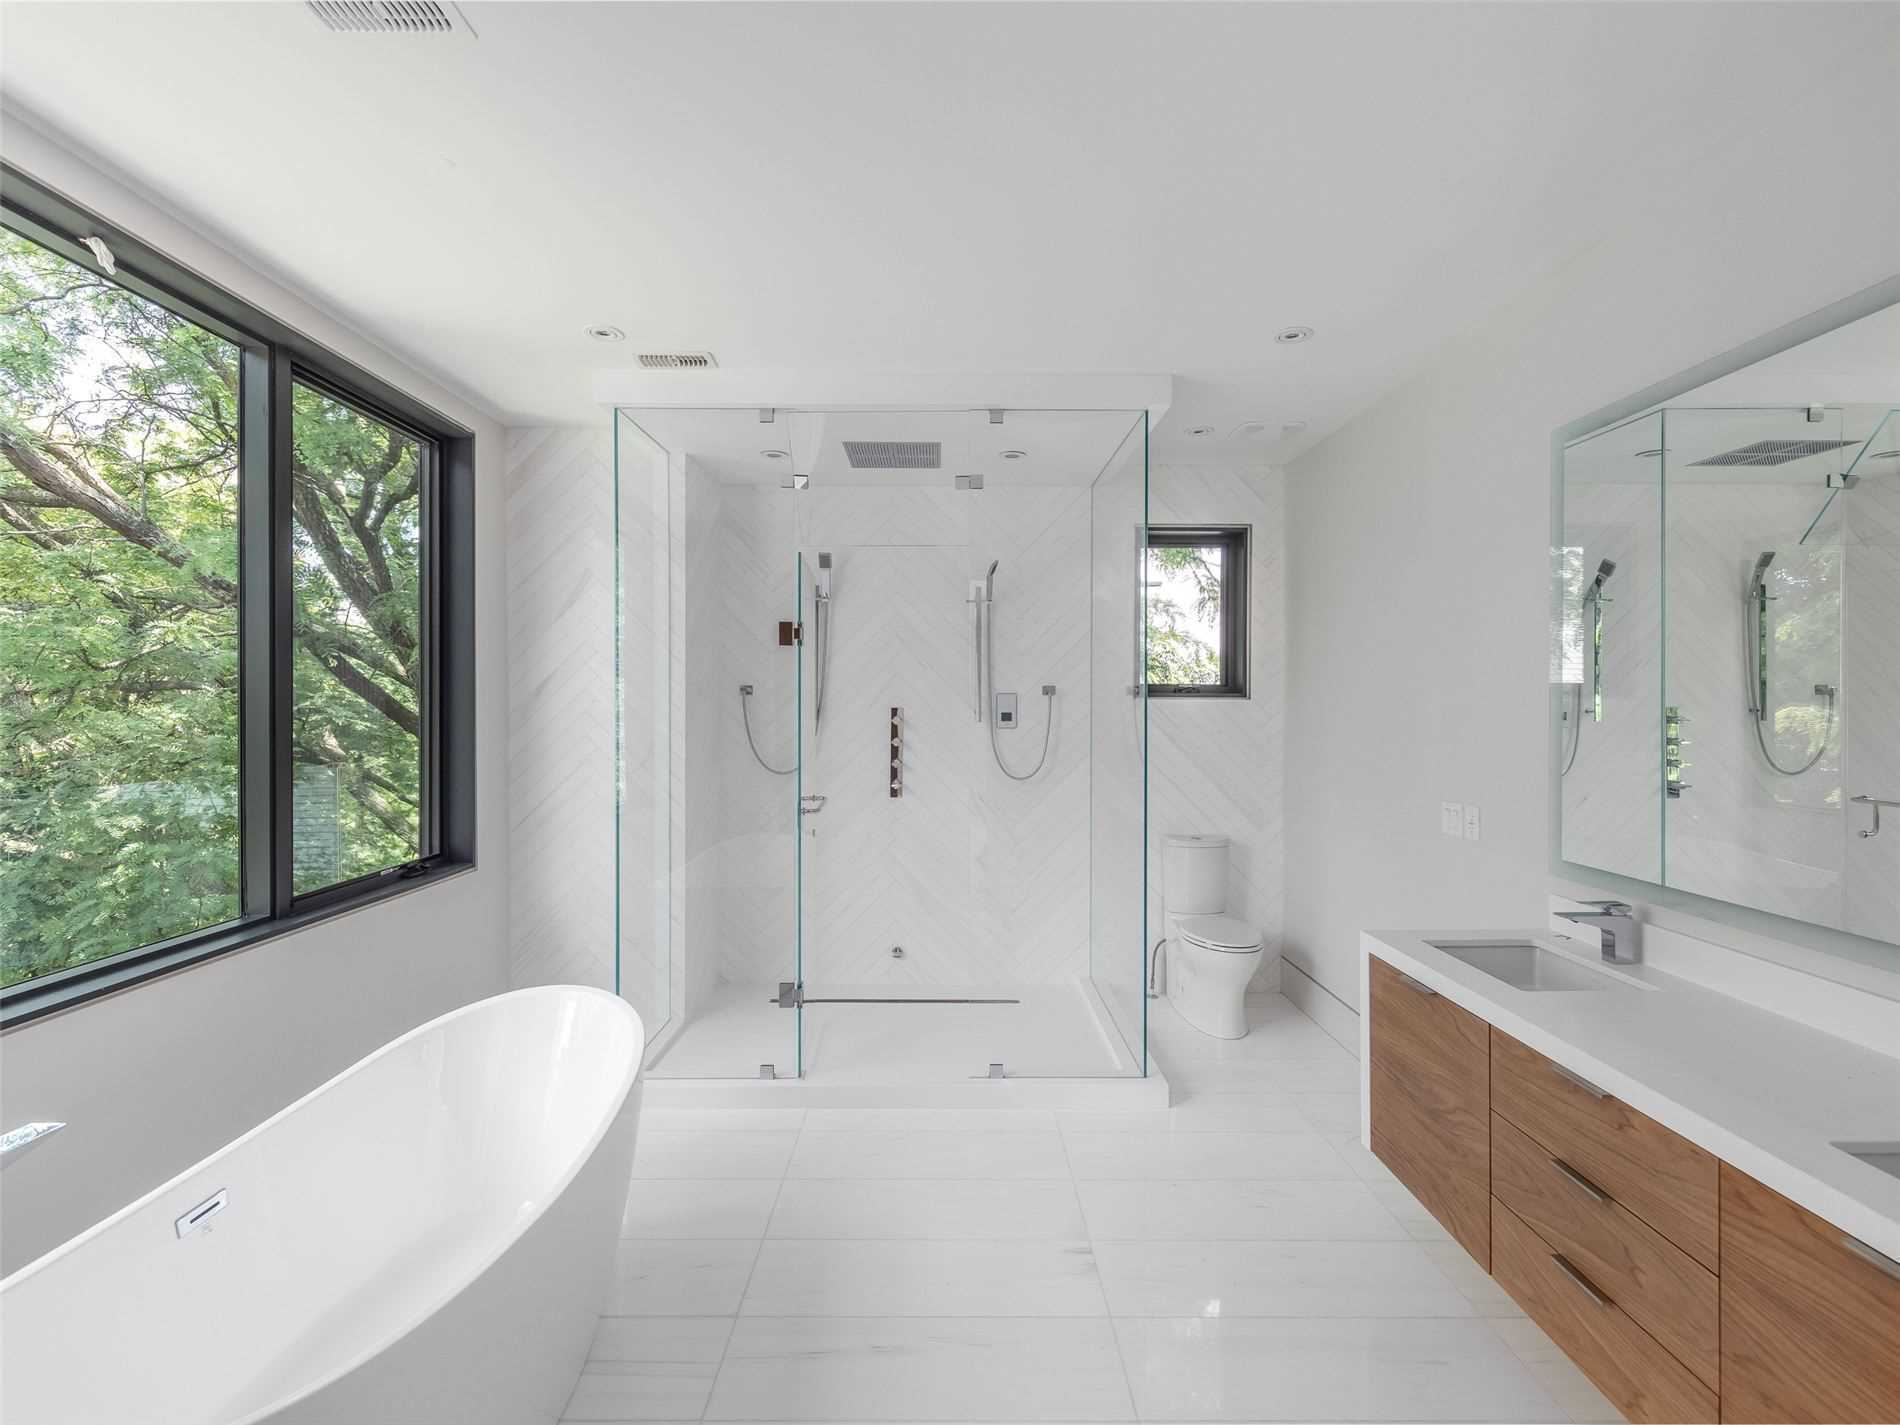 282 Dawlish Ave, Toronto, Ontario M4N1J5, 4 Bedrooms Bedrooms, 11 Rooms Rooms,6 BathroomsBathrooms,Detached,For Sale,Dawlish,C4819558